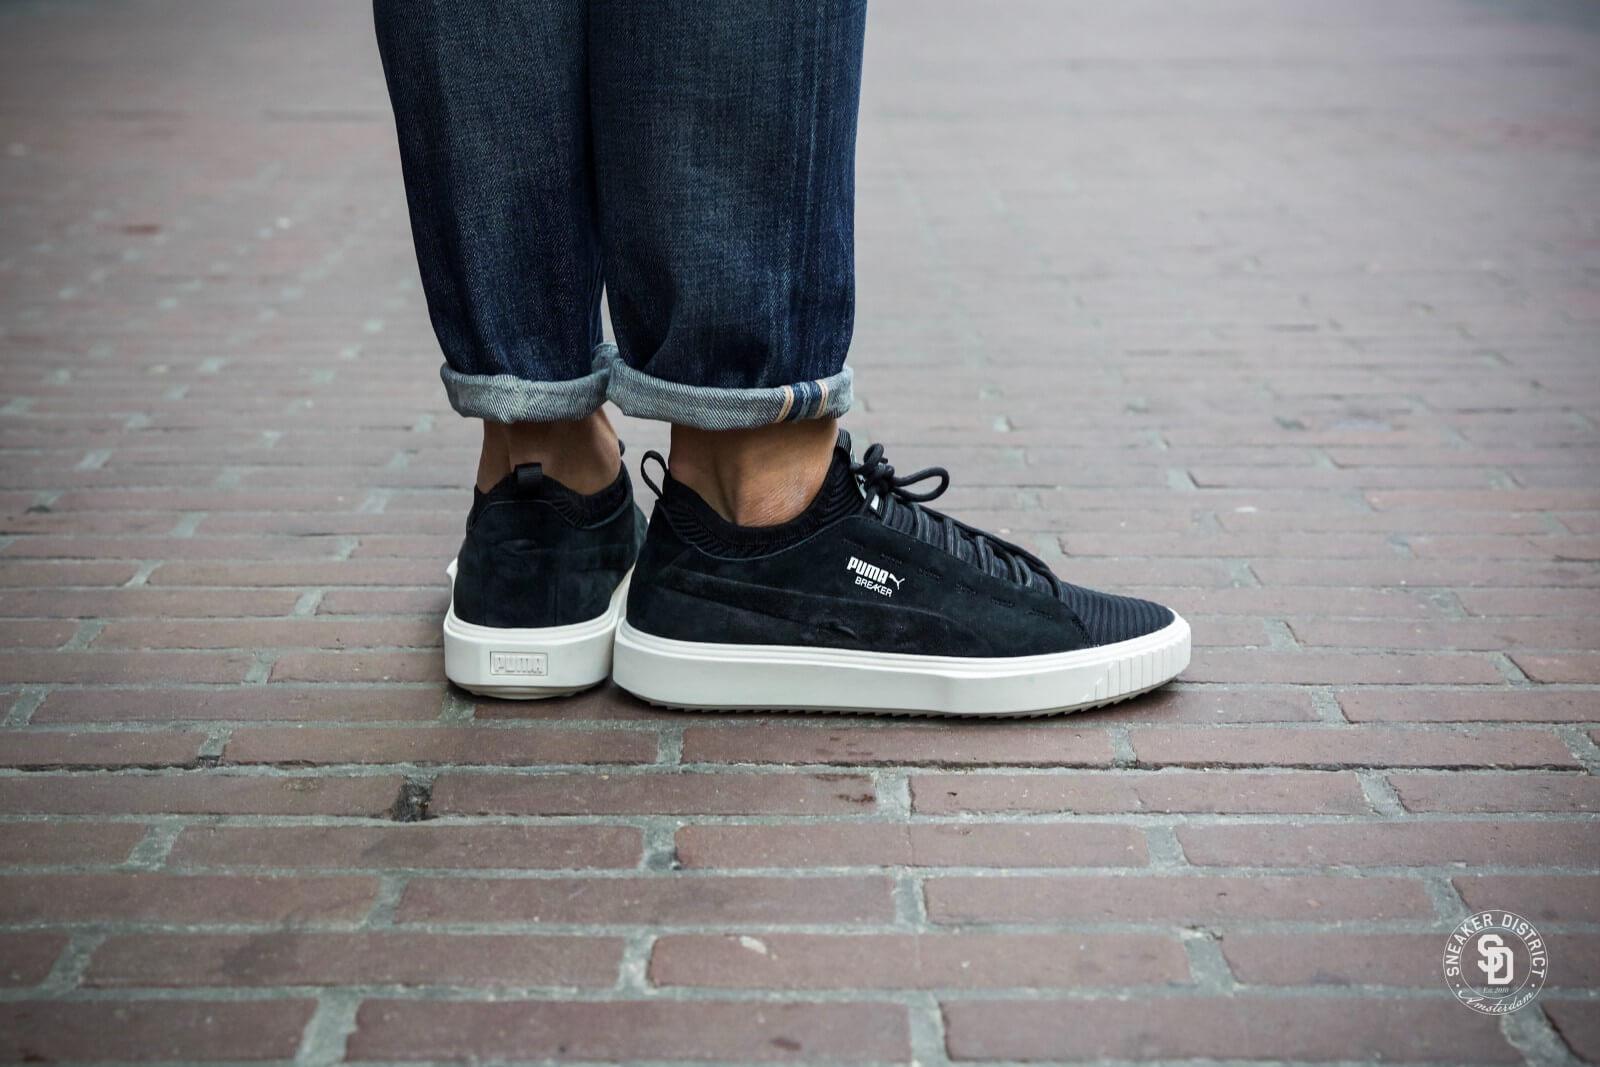 official photos exclusive deals official shop Puma Breaker Knit Sunfaded Puma Black/Whisper White - 0365345 01